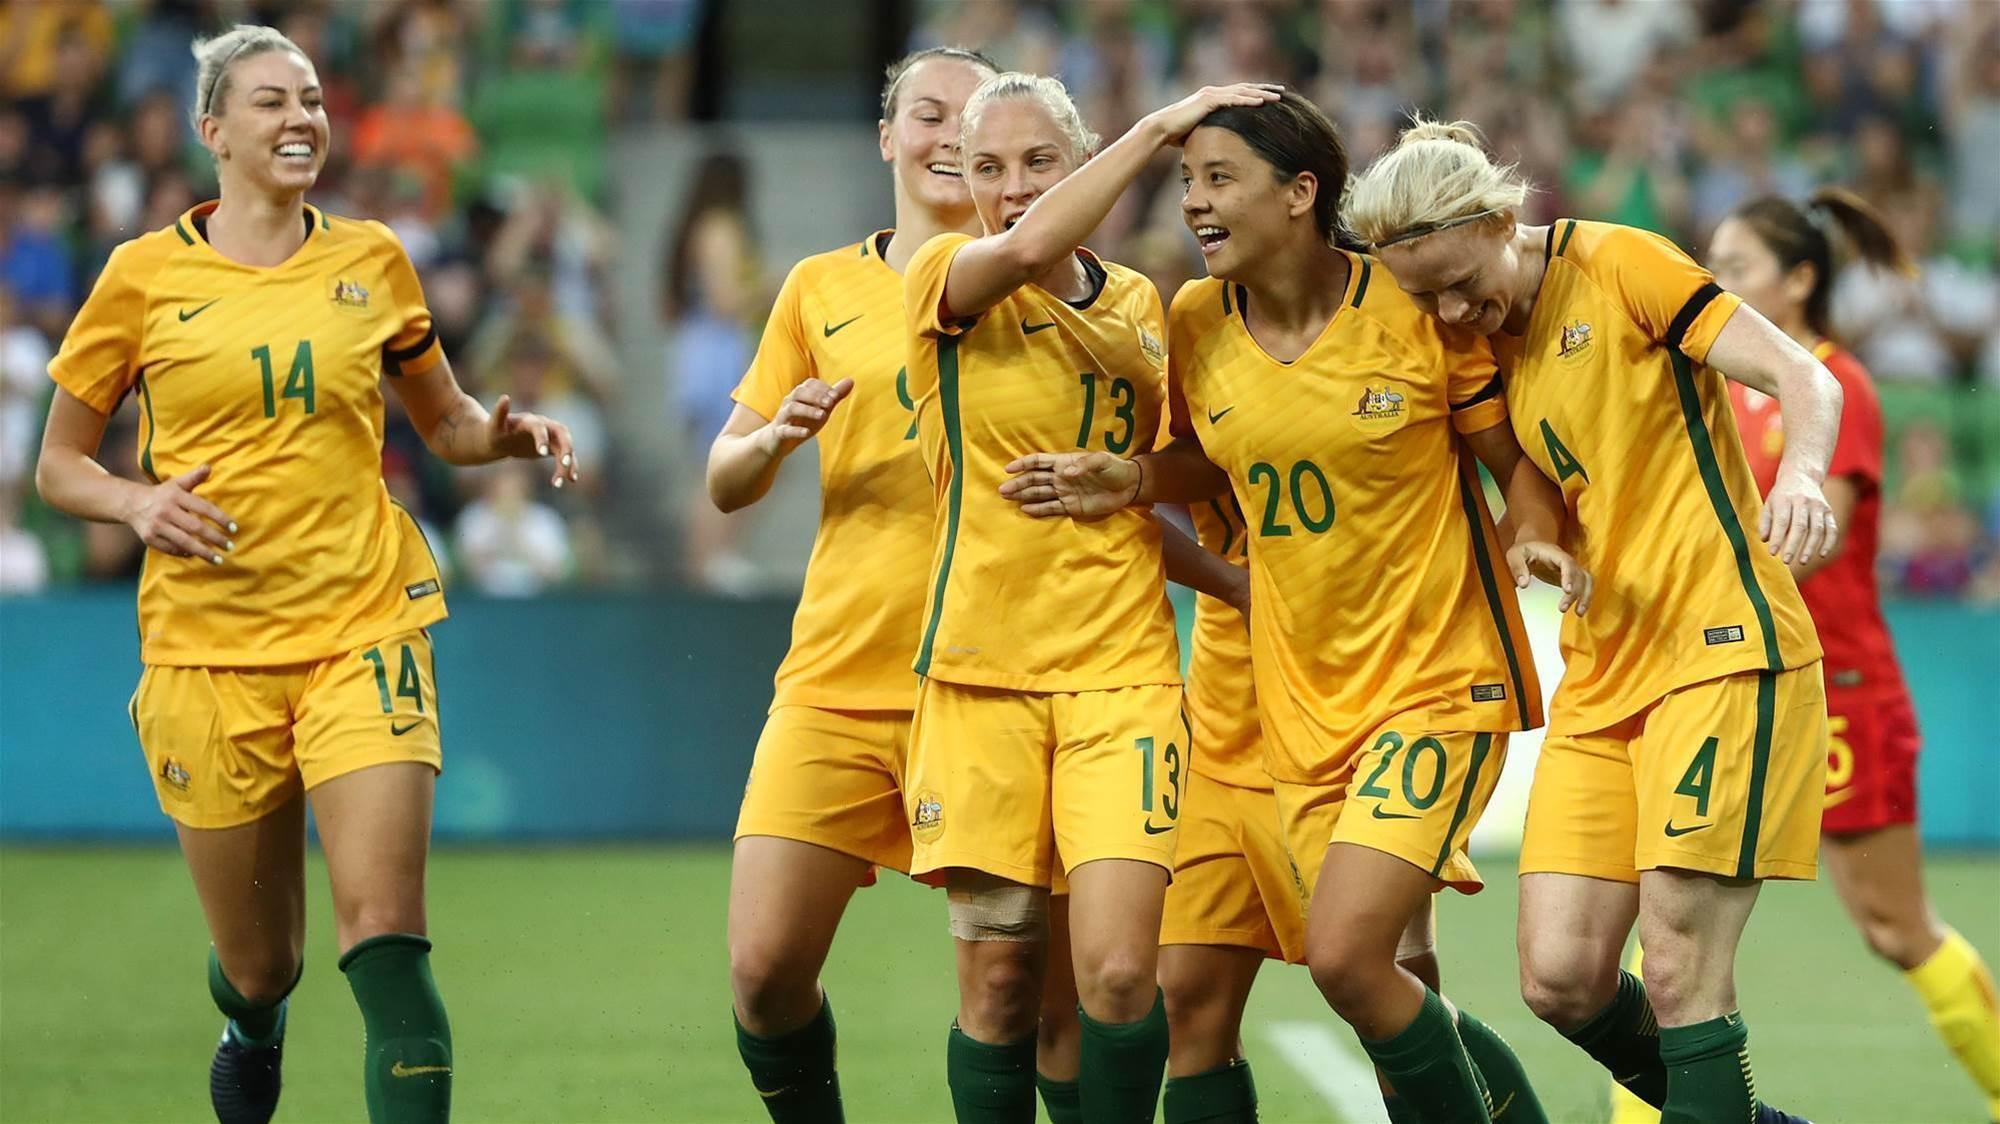 Matildas: This is the golden generation